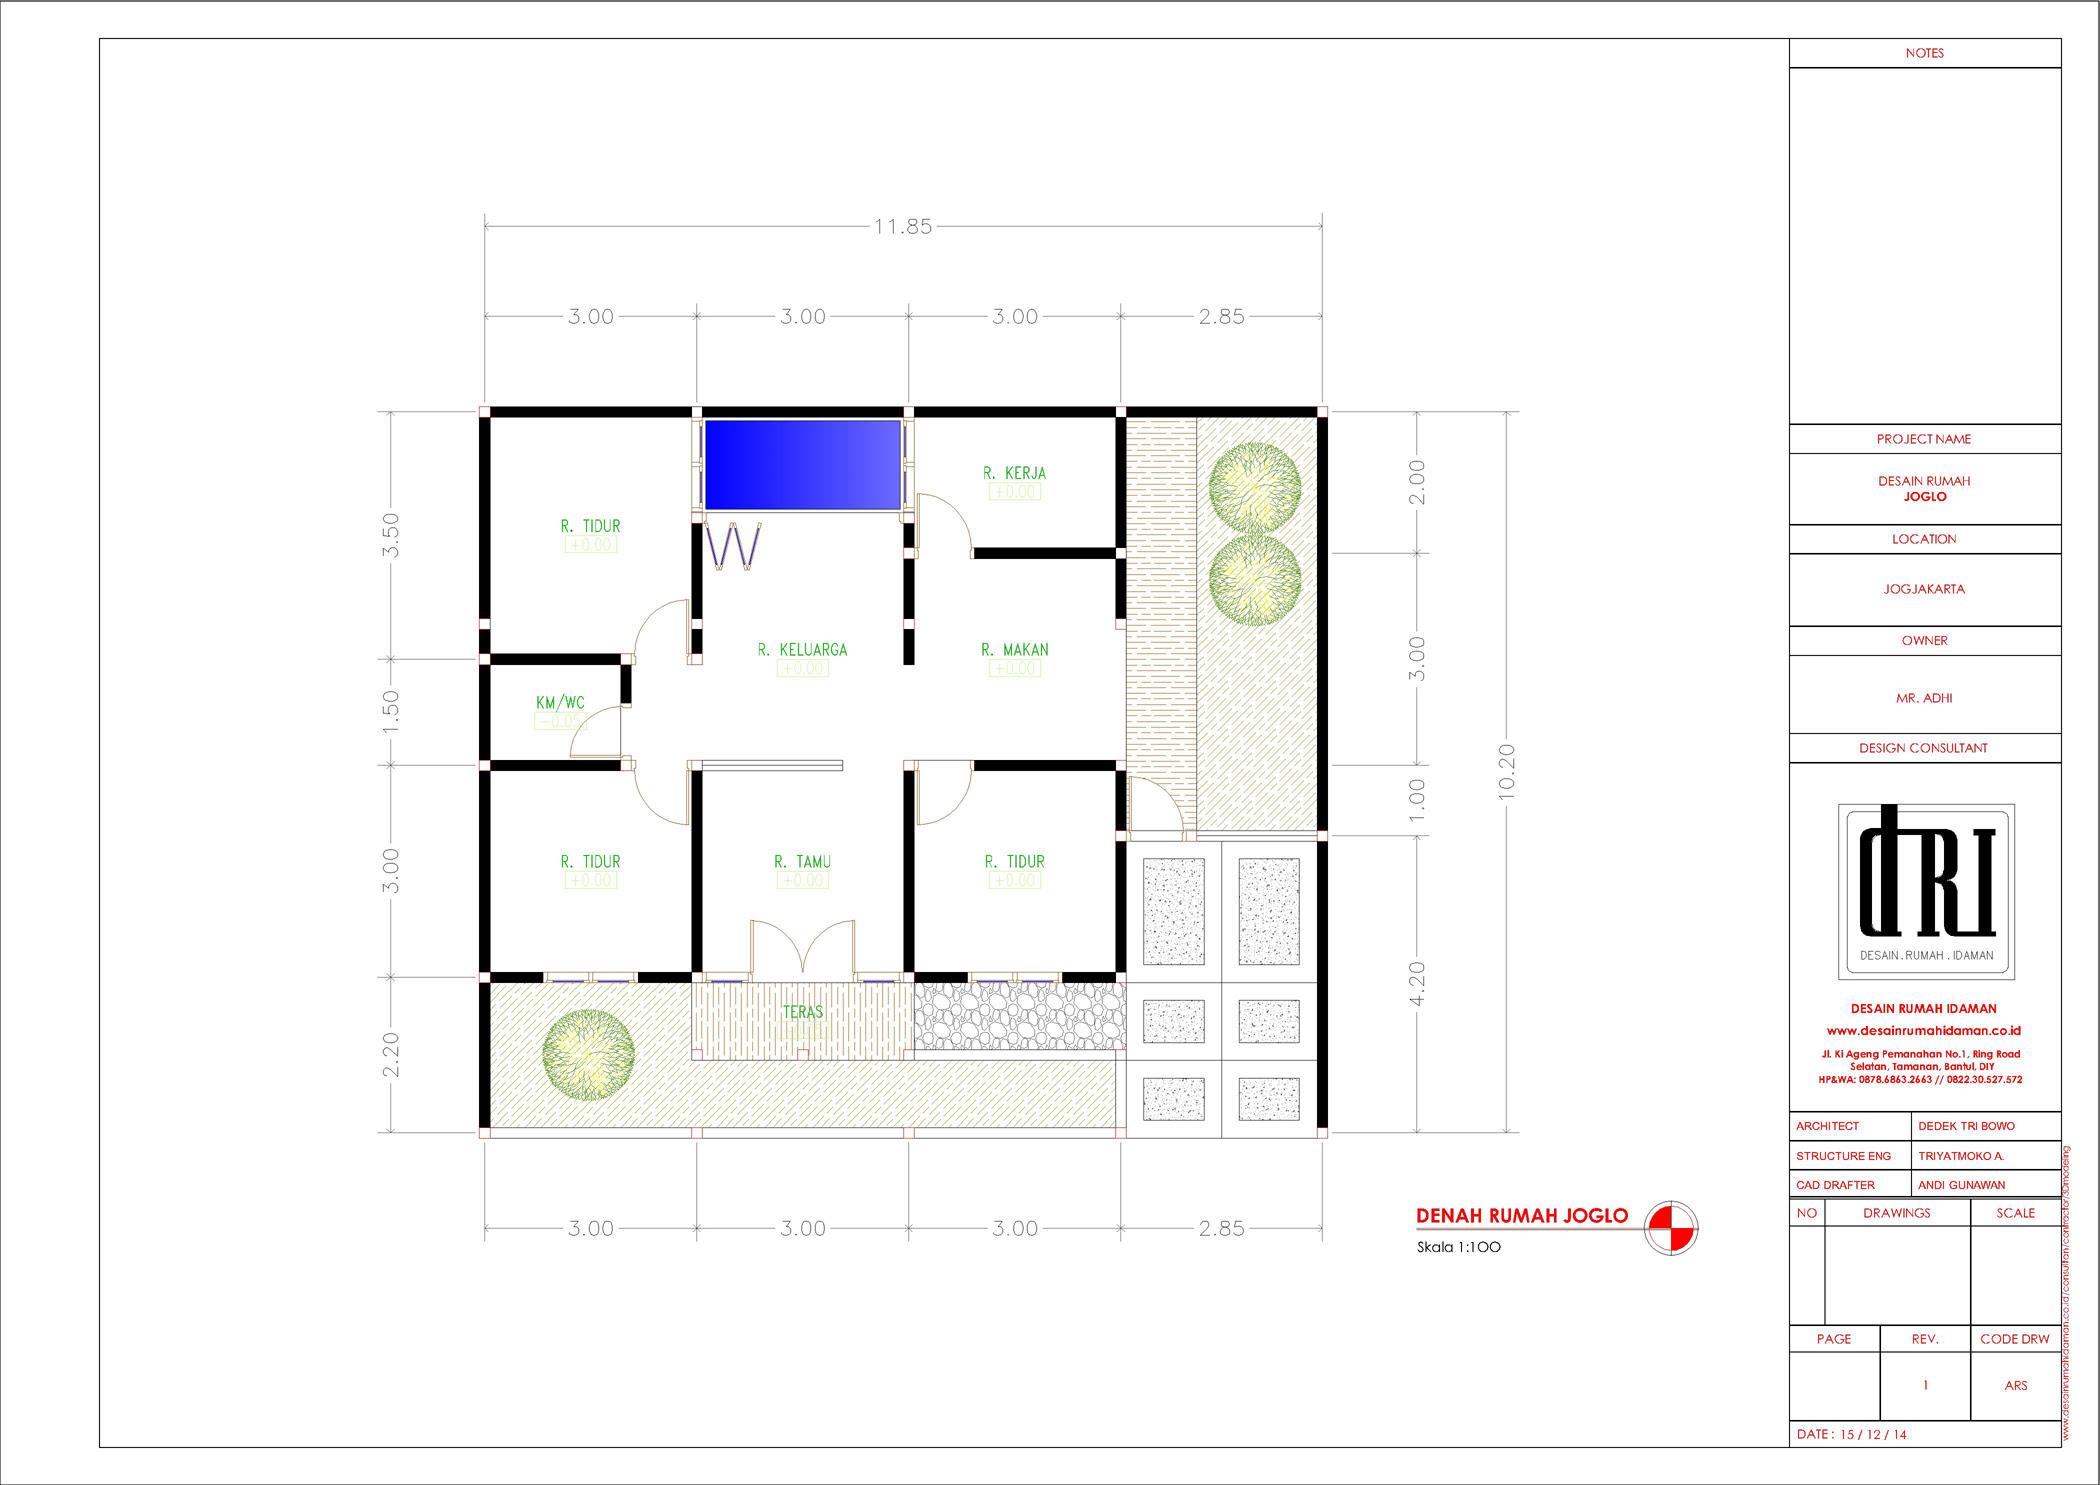 30 Contoh Gambar Denah Rumah Joglo Terbaru Koleksi Gambar